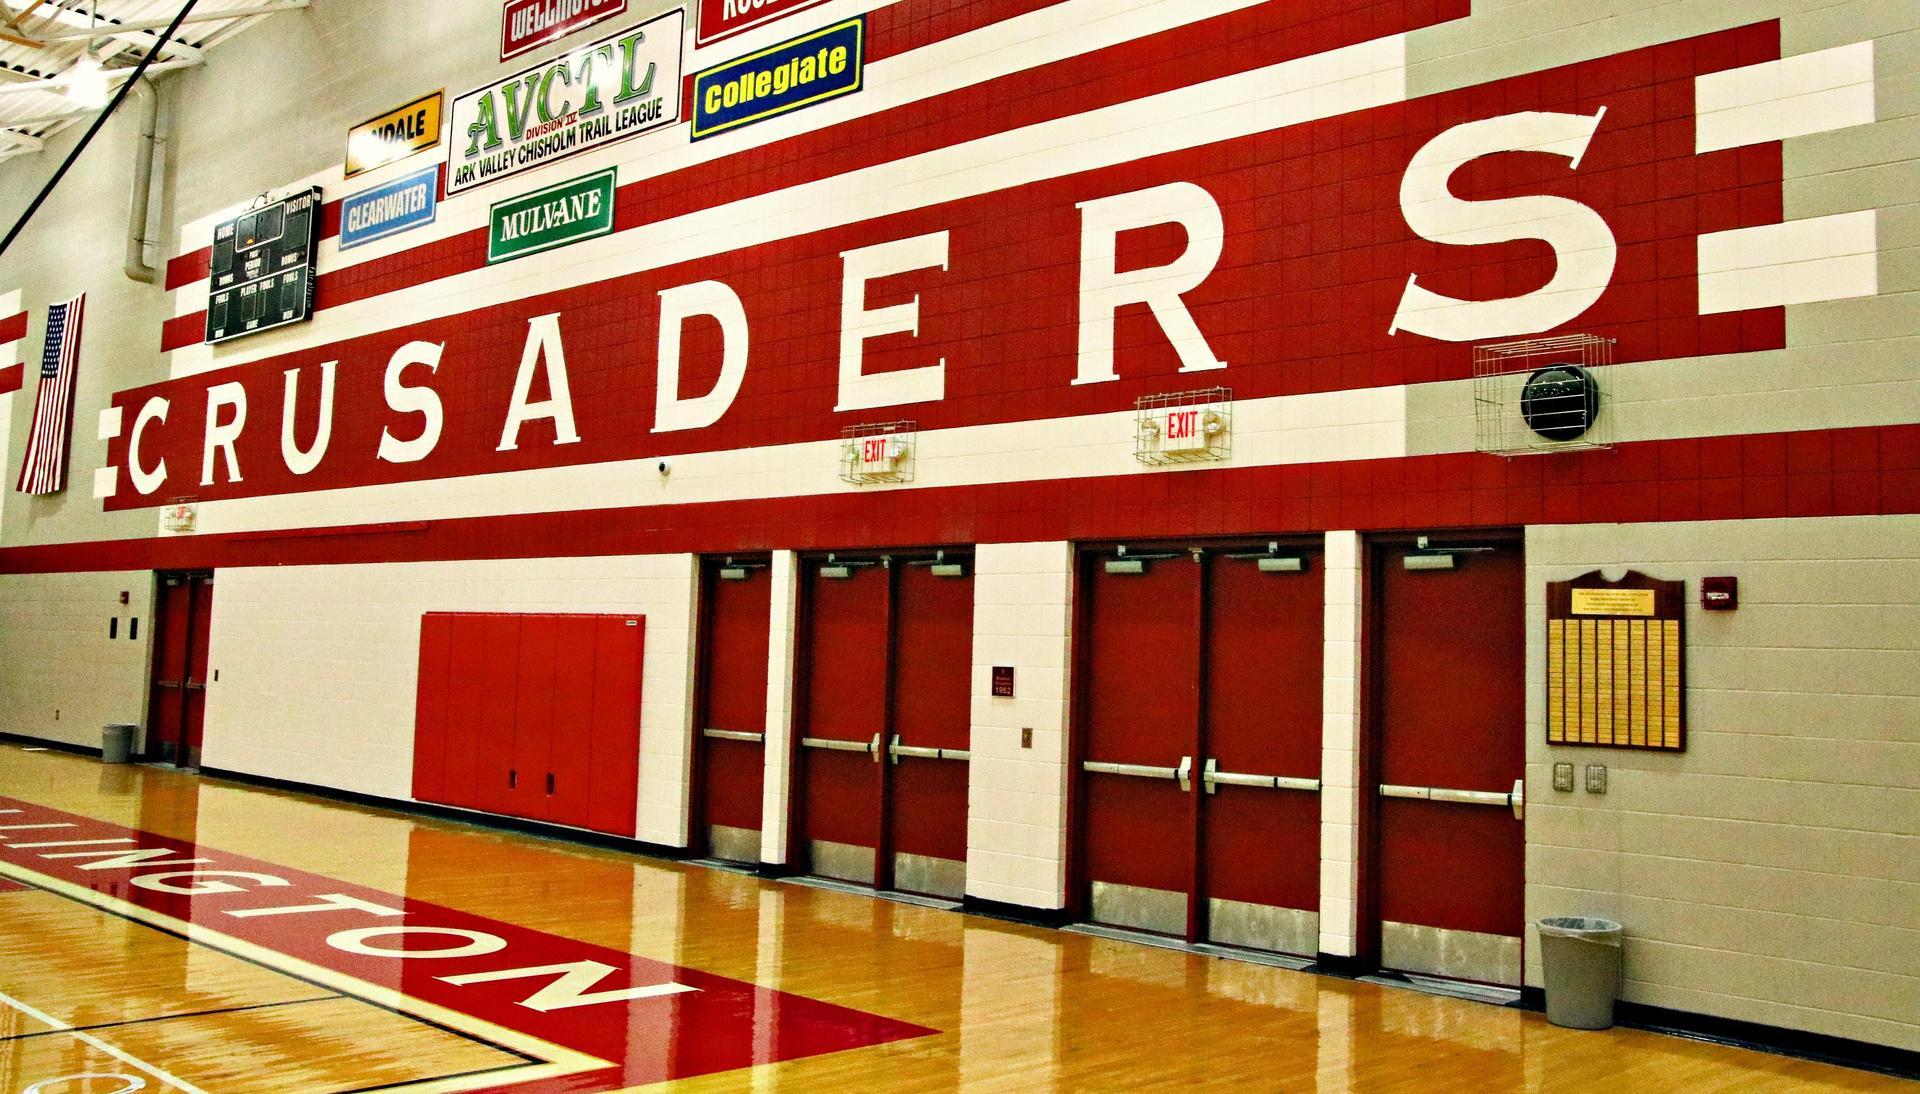 Crusader Main Gym @ Wellington High School